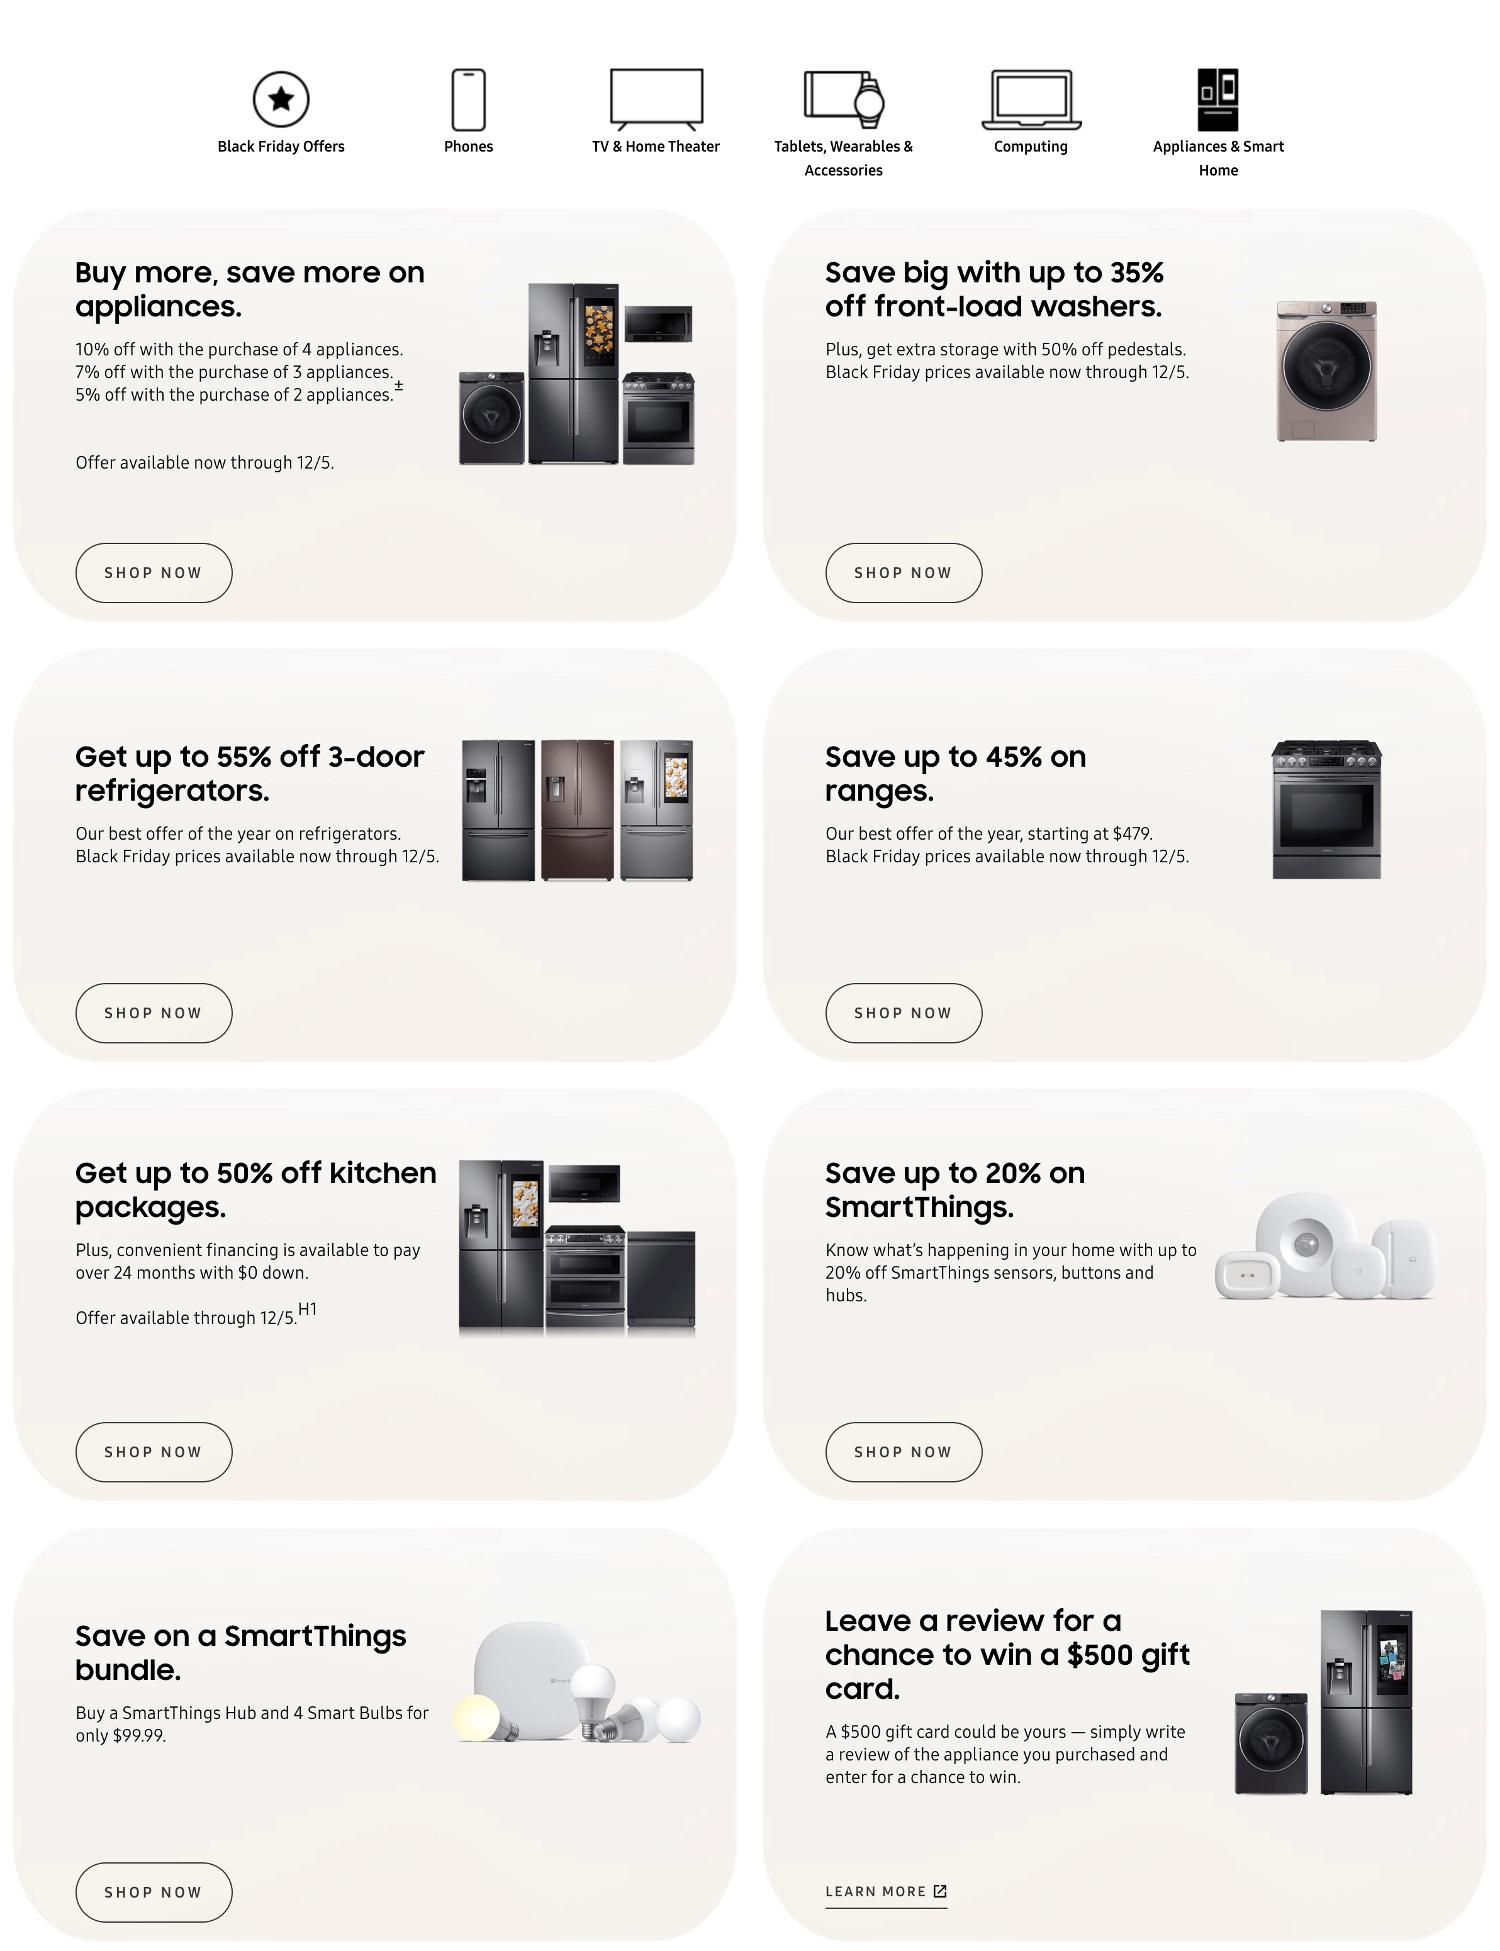 Samsung Black Friday 2019 Page 5